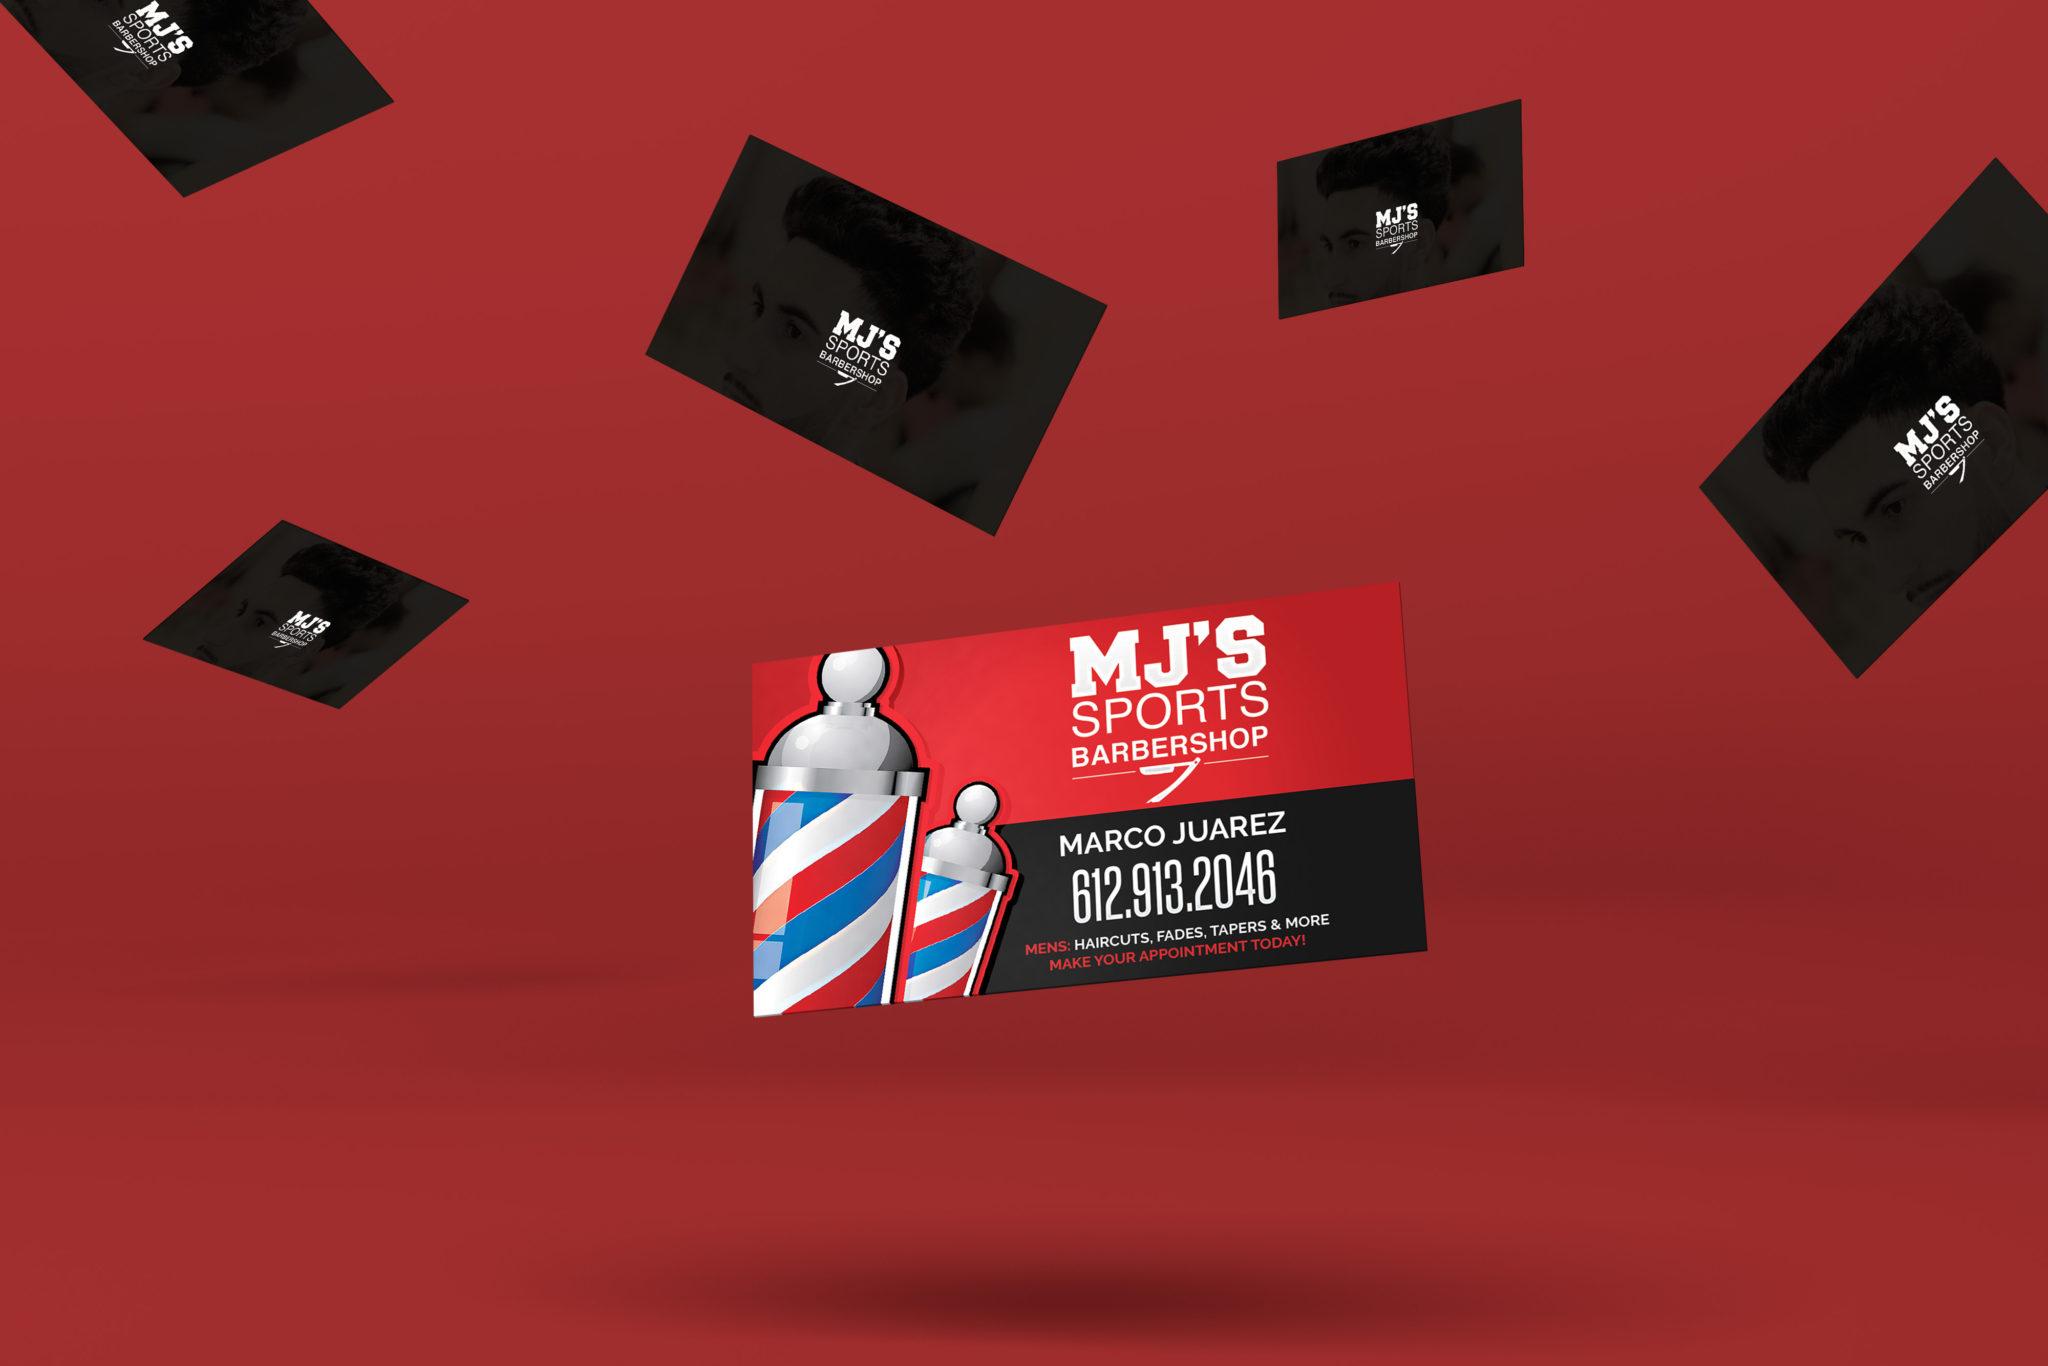 Mjs sports barbershop